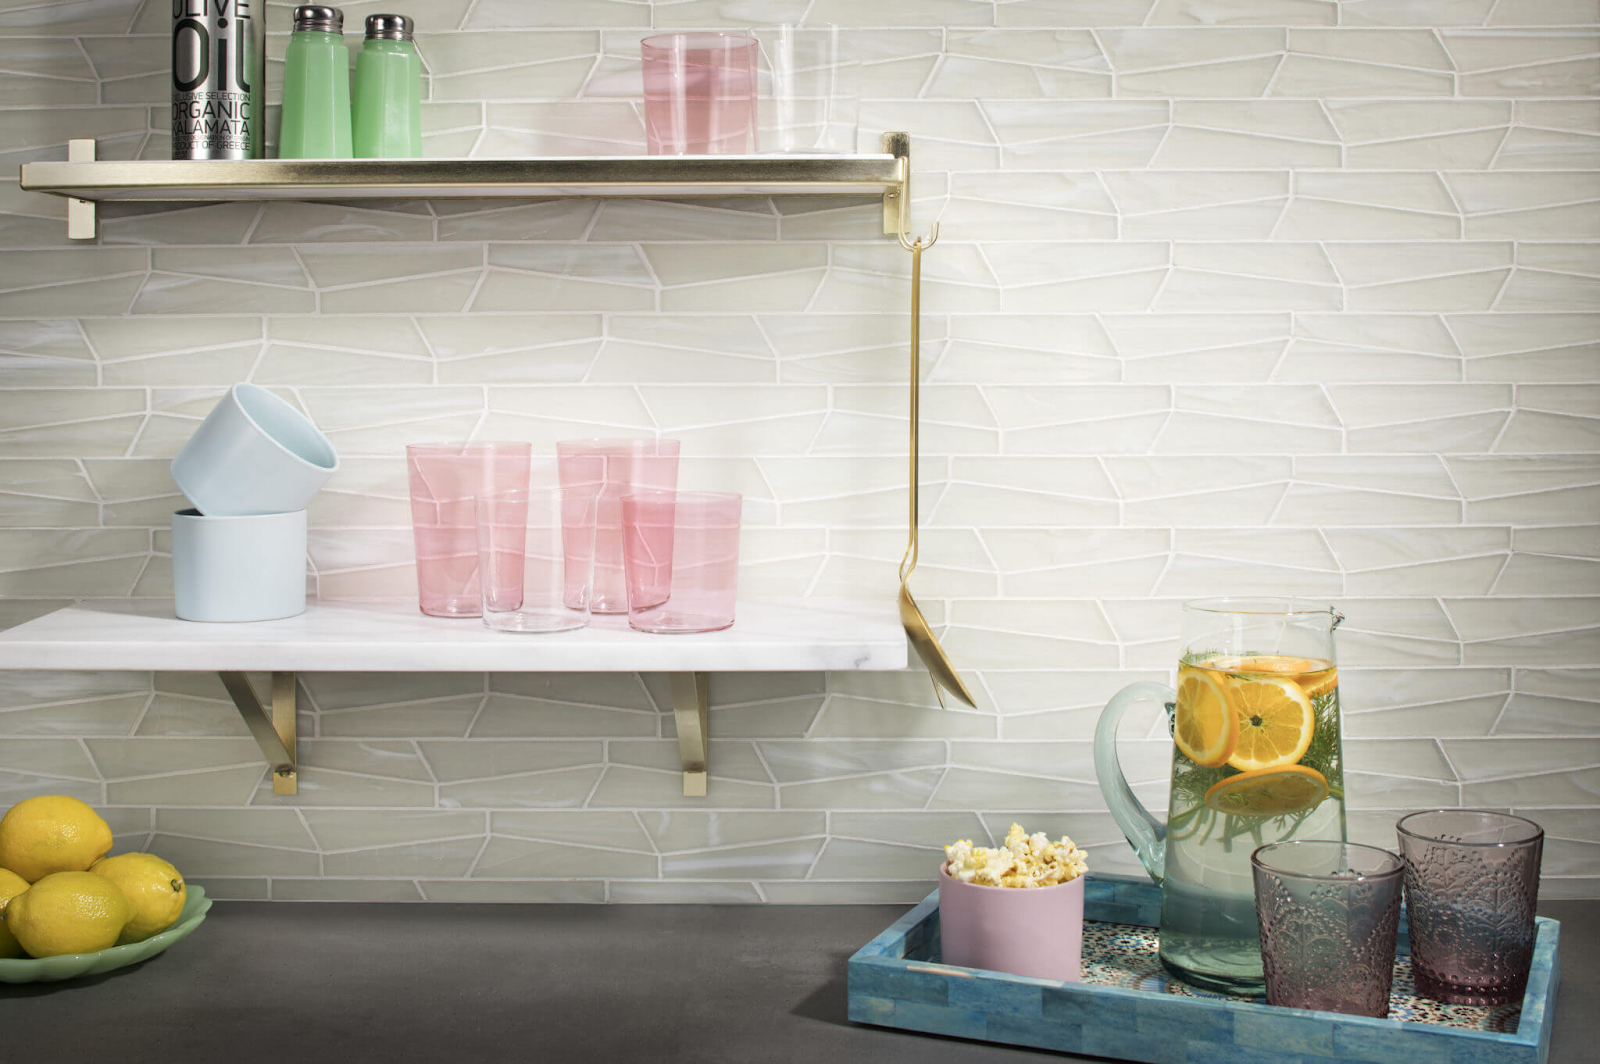 Light mosaic tile kitchen backsplash in irregular shapes